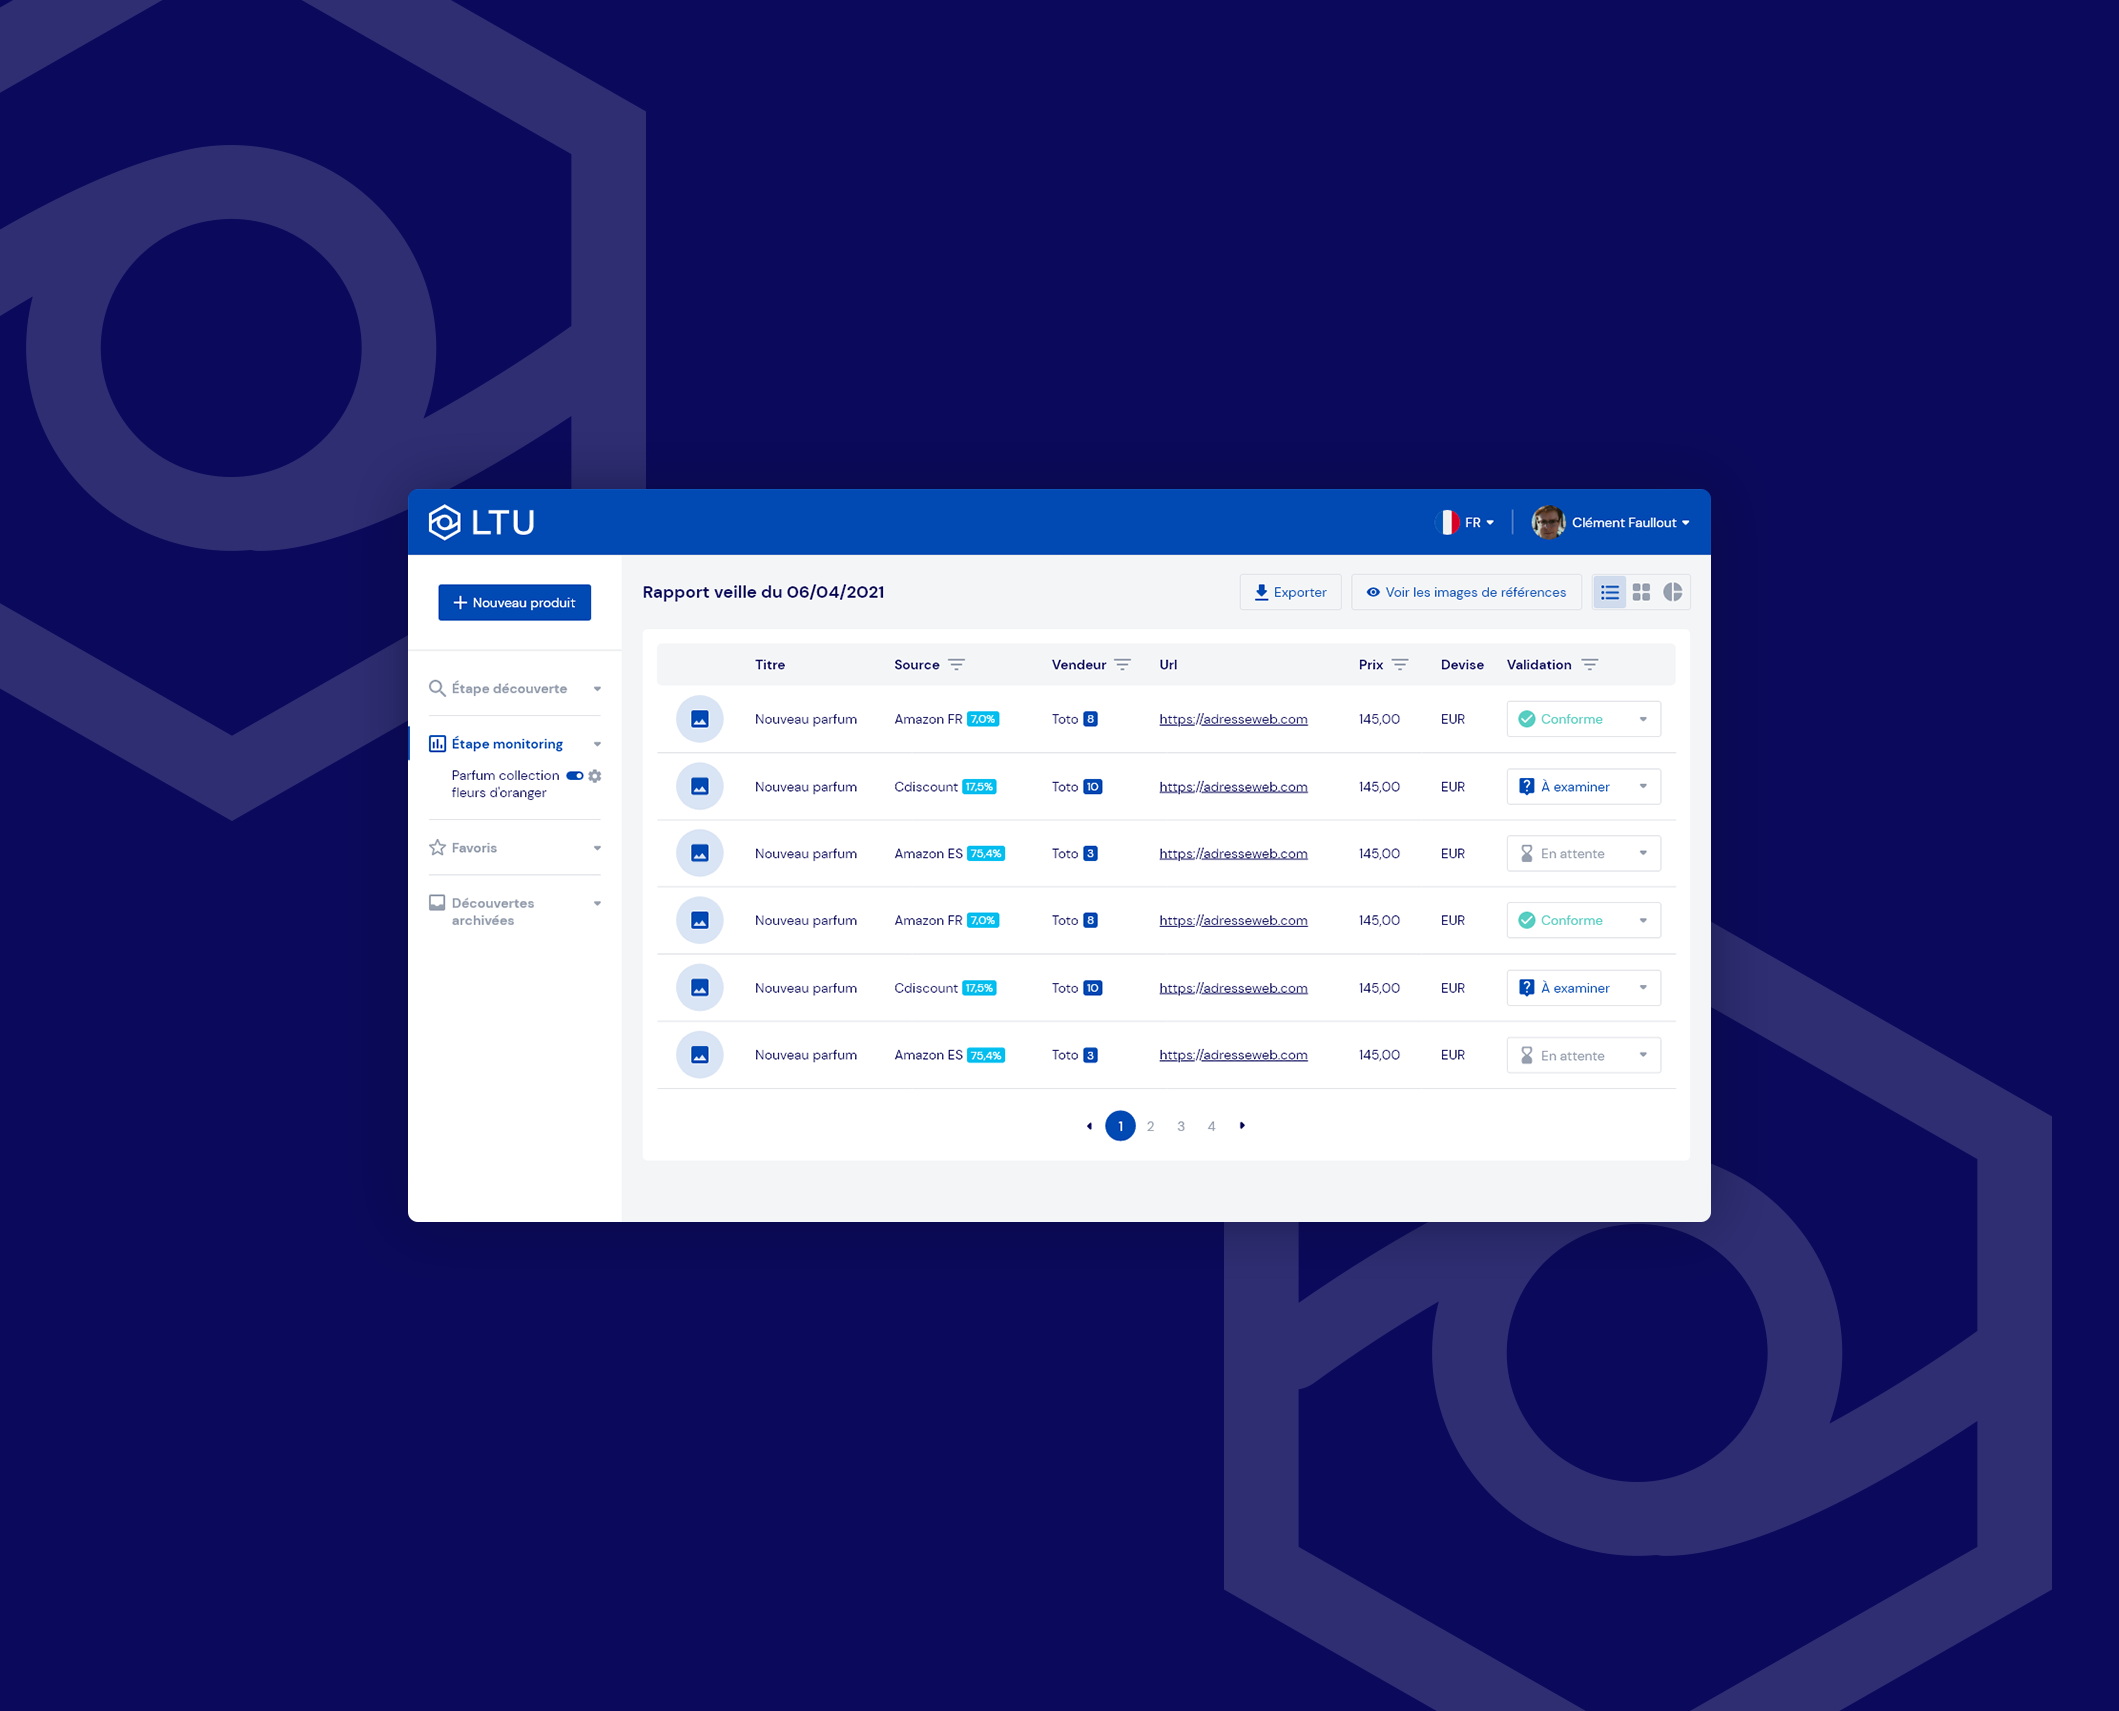 watchdog : visual search platform for brand monitoring